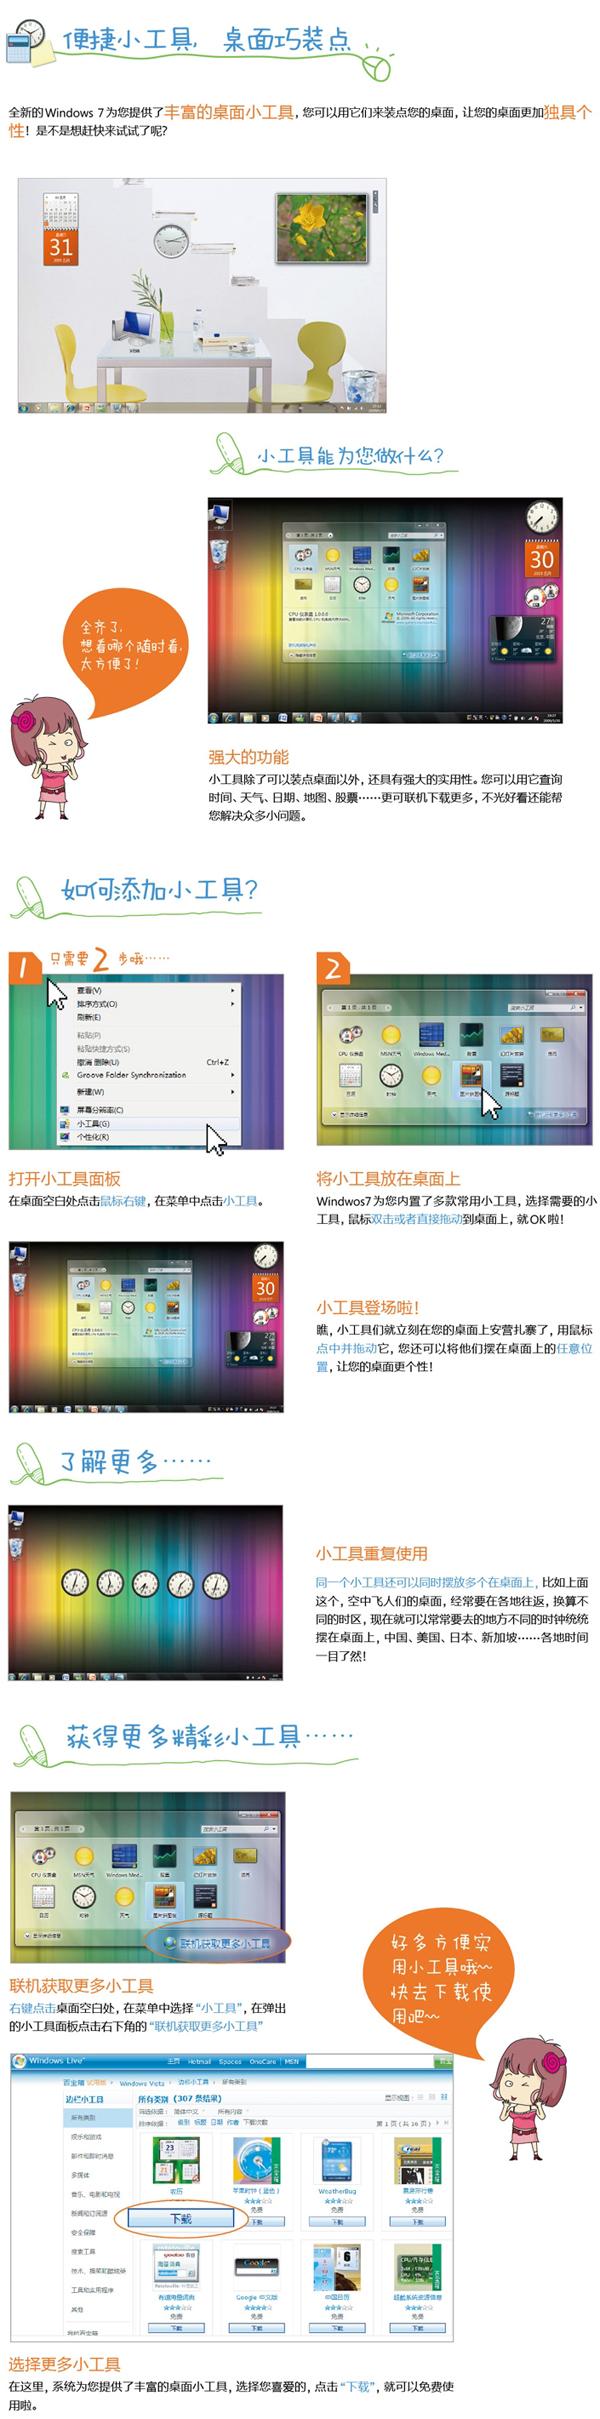 Windows 7漫画专辑:便捷小工具